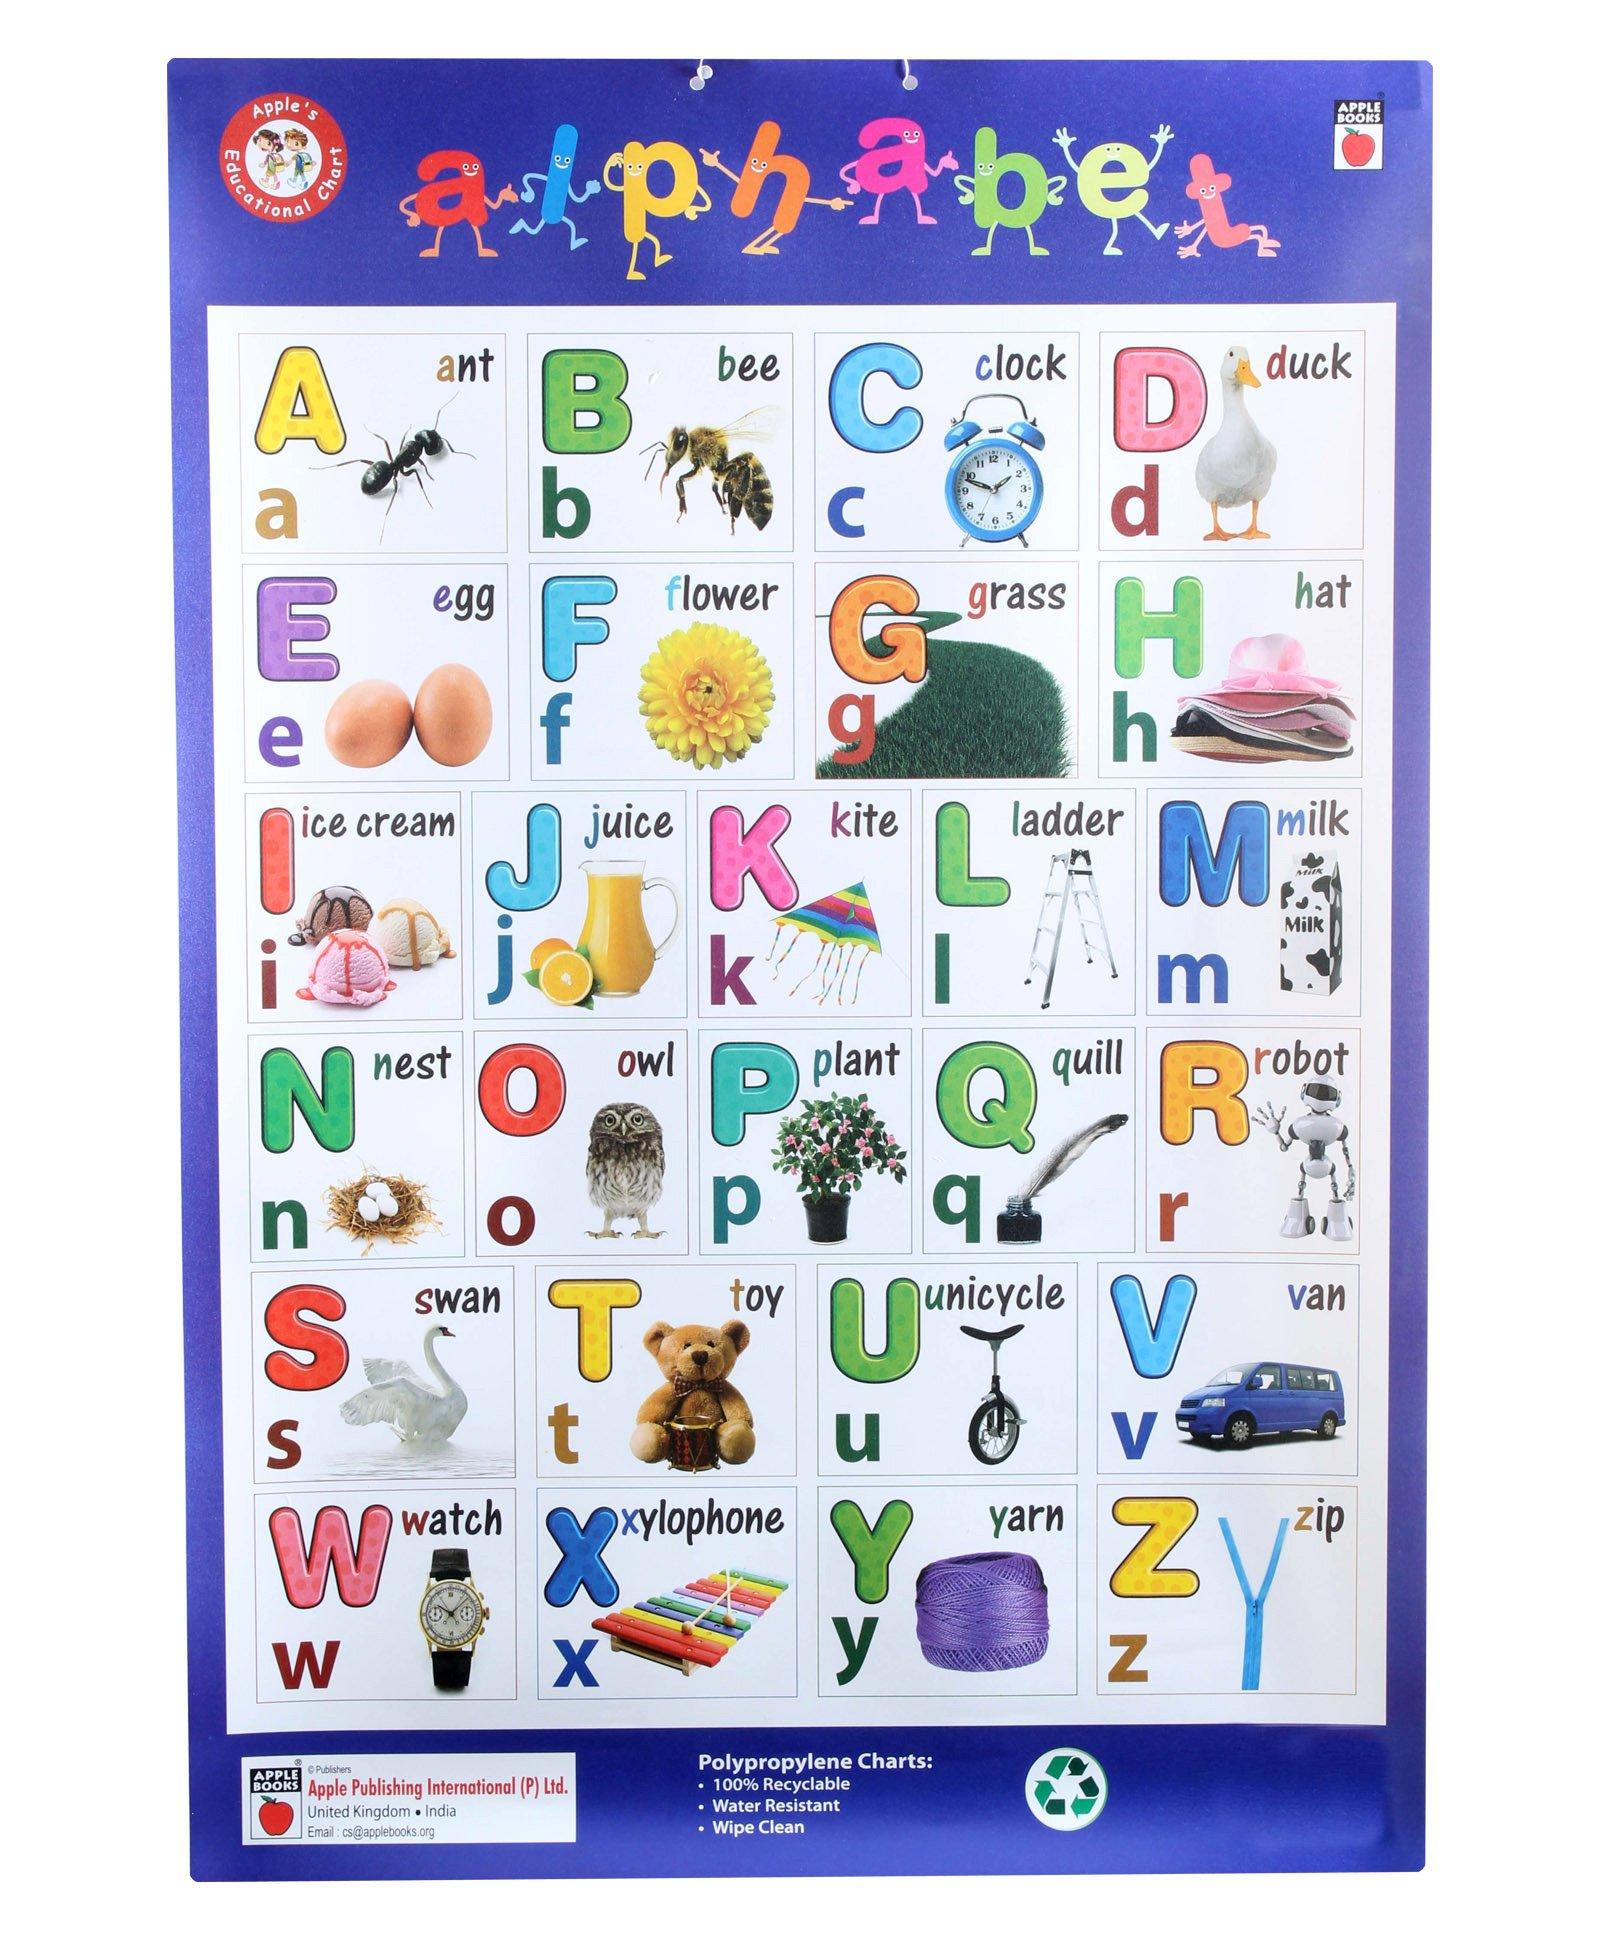 English Alphabets Chart Apple books - alphabets